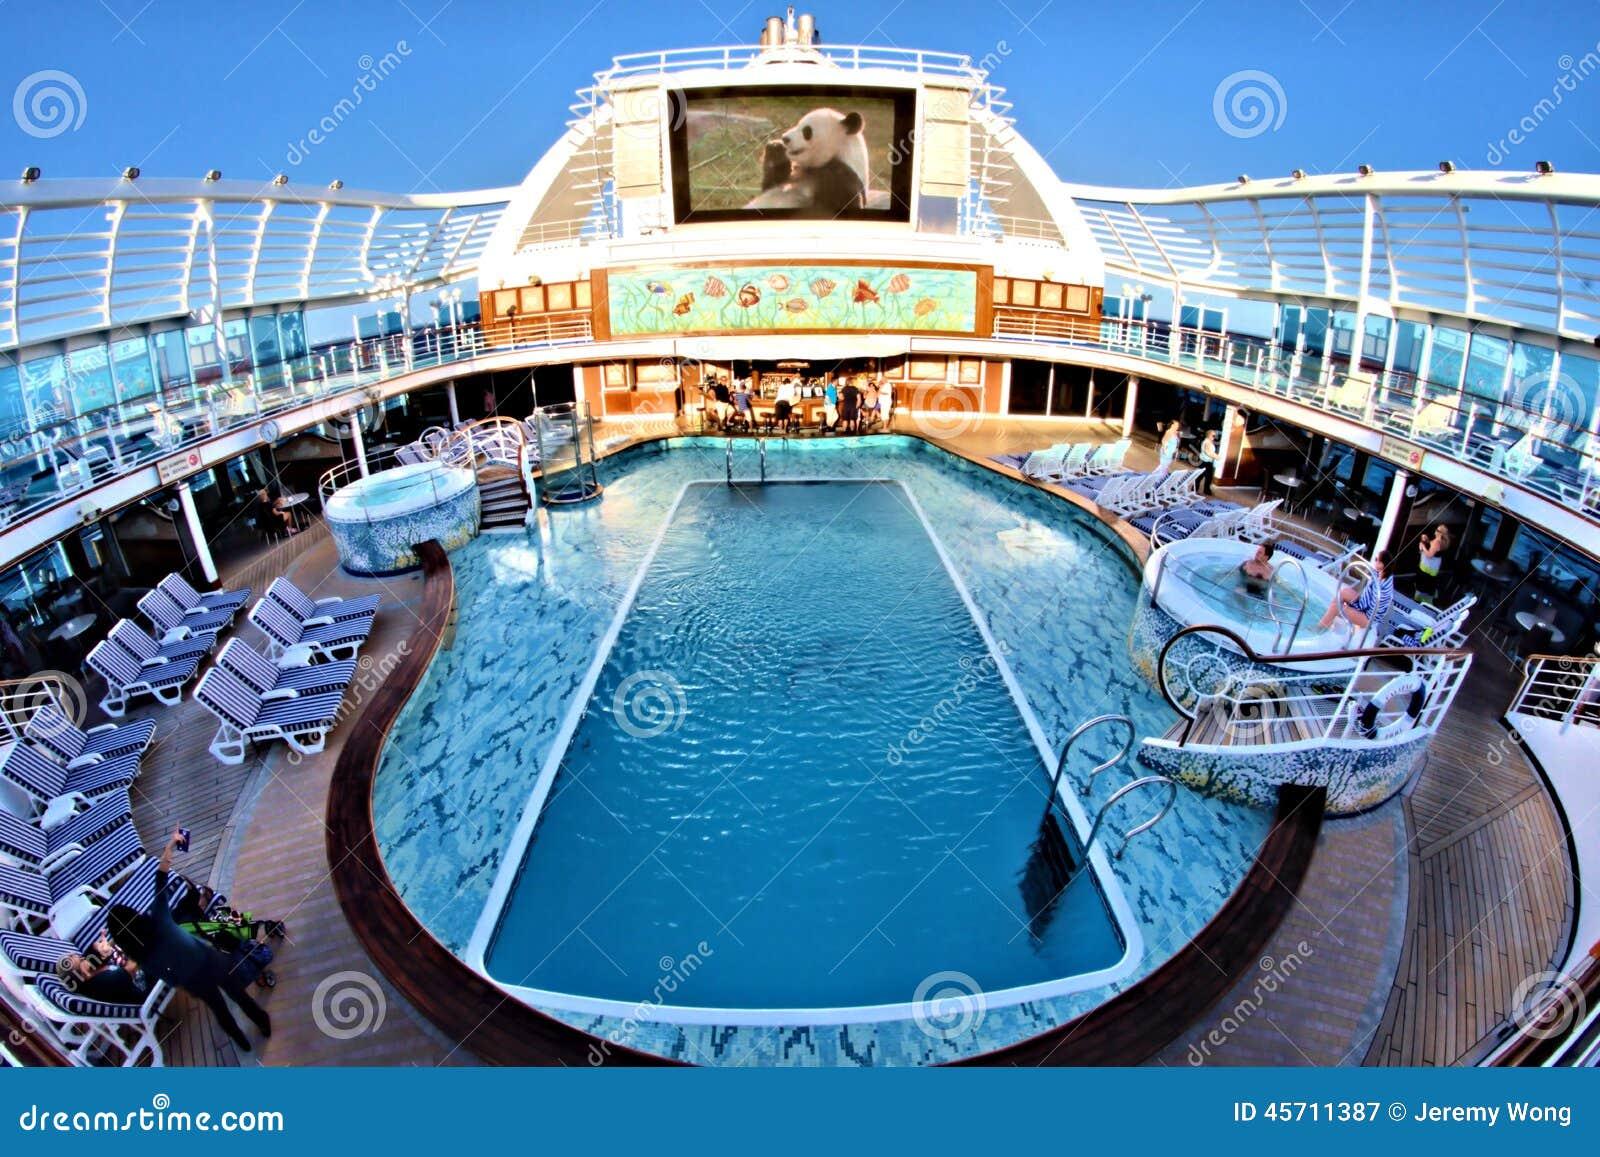 Cruise Ship Stock Image Image Of Ocean Boat Swim River - Cruise ship movie